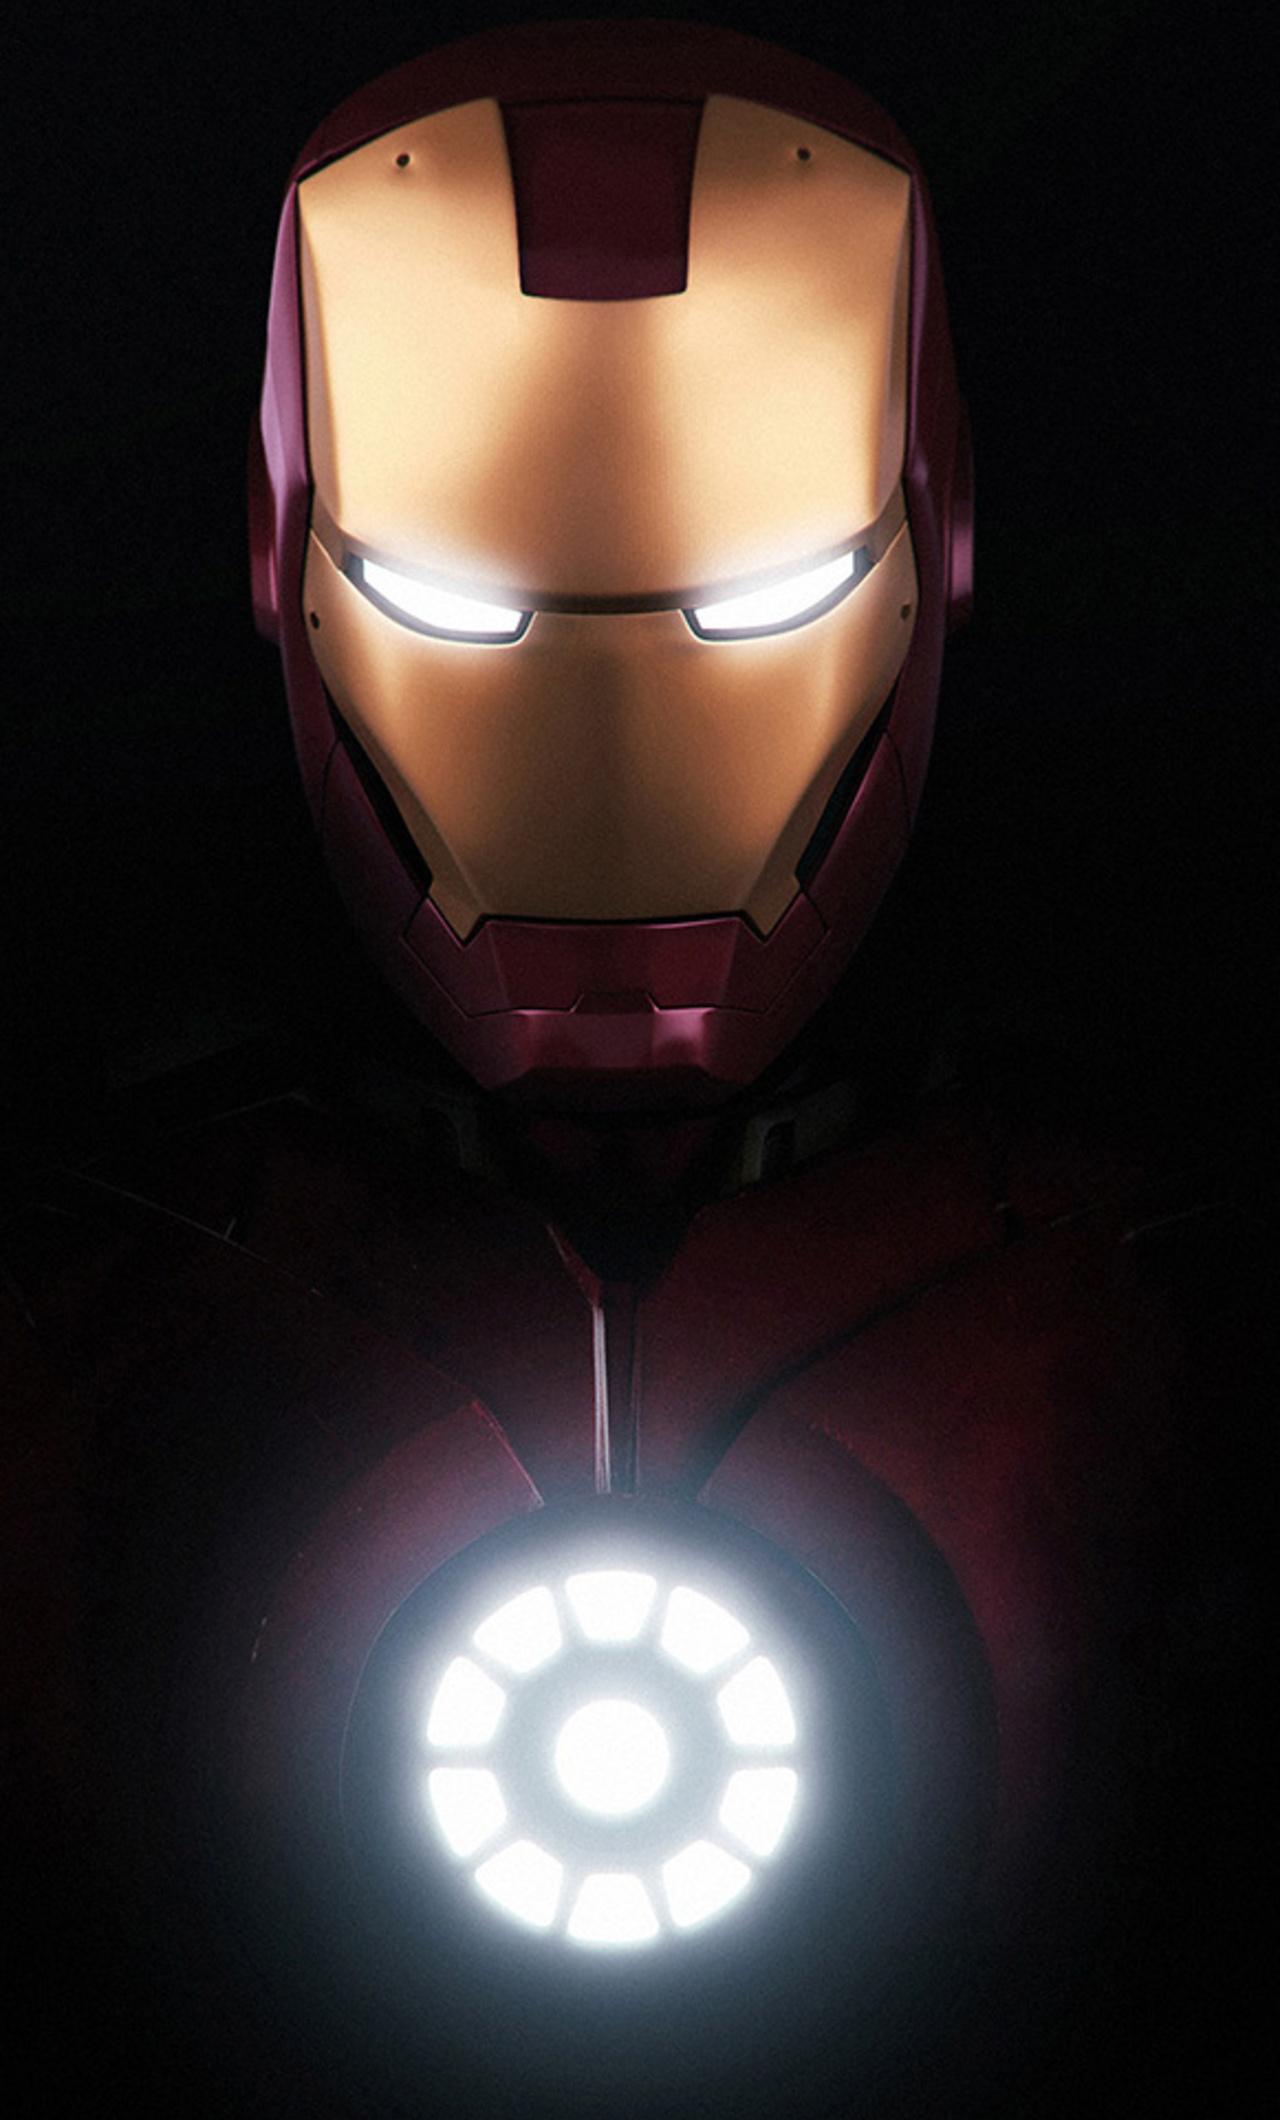 iron-man-fan-made-art-v8.jpg